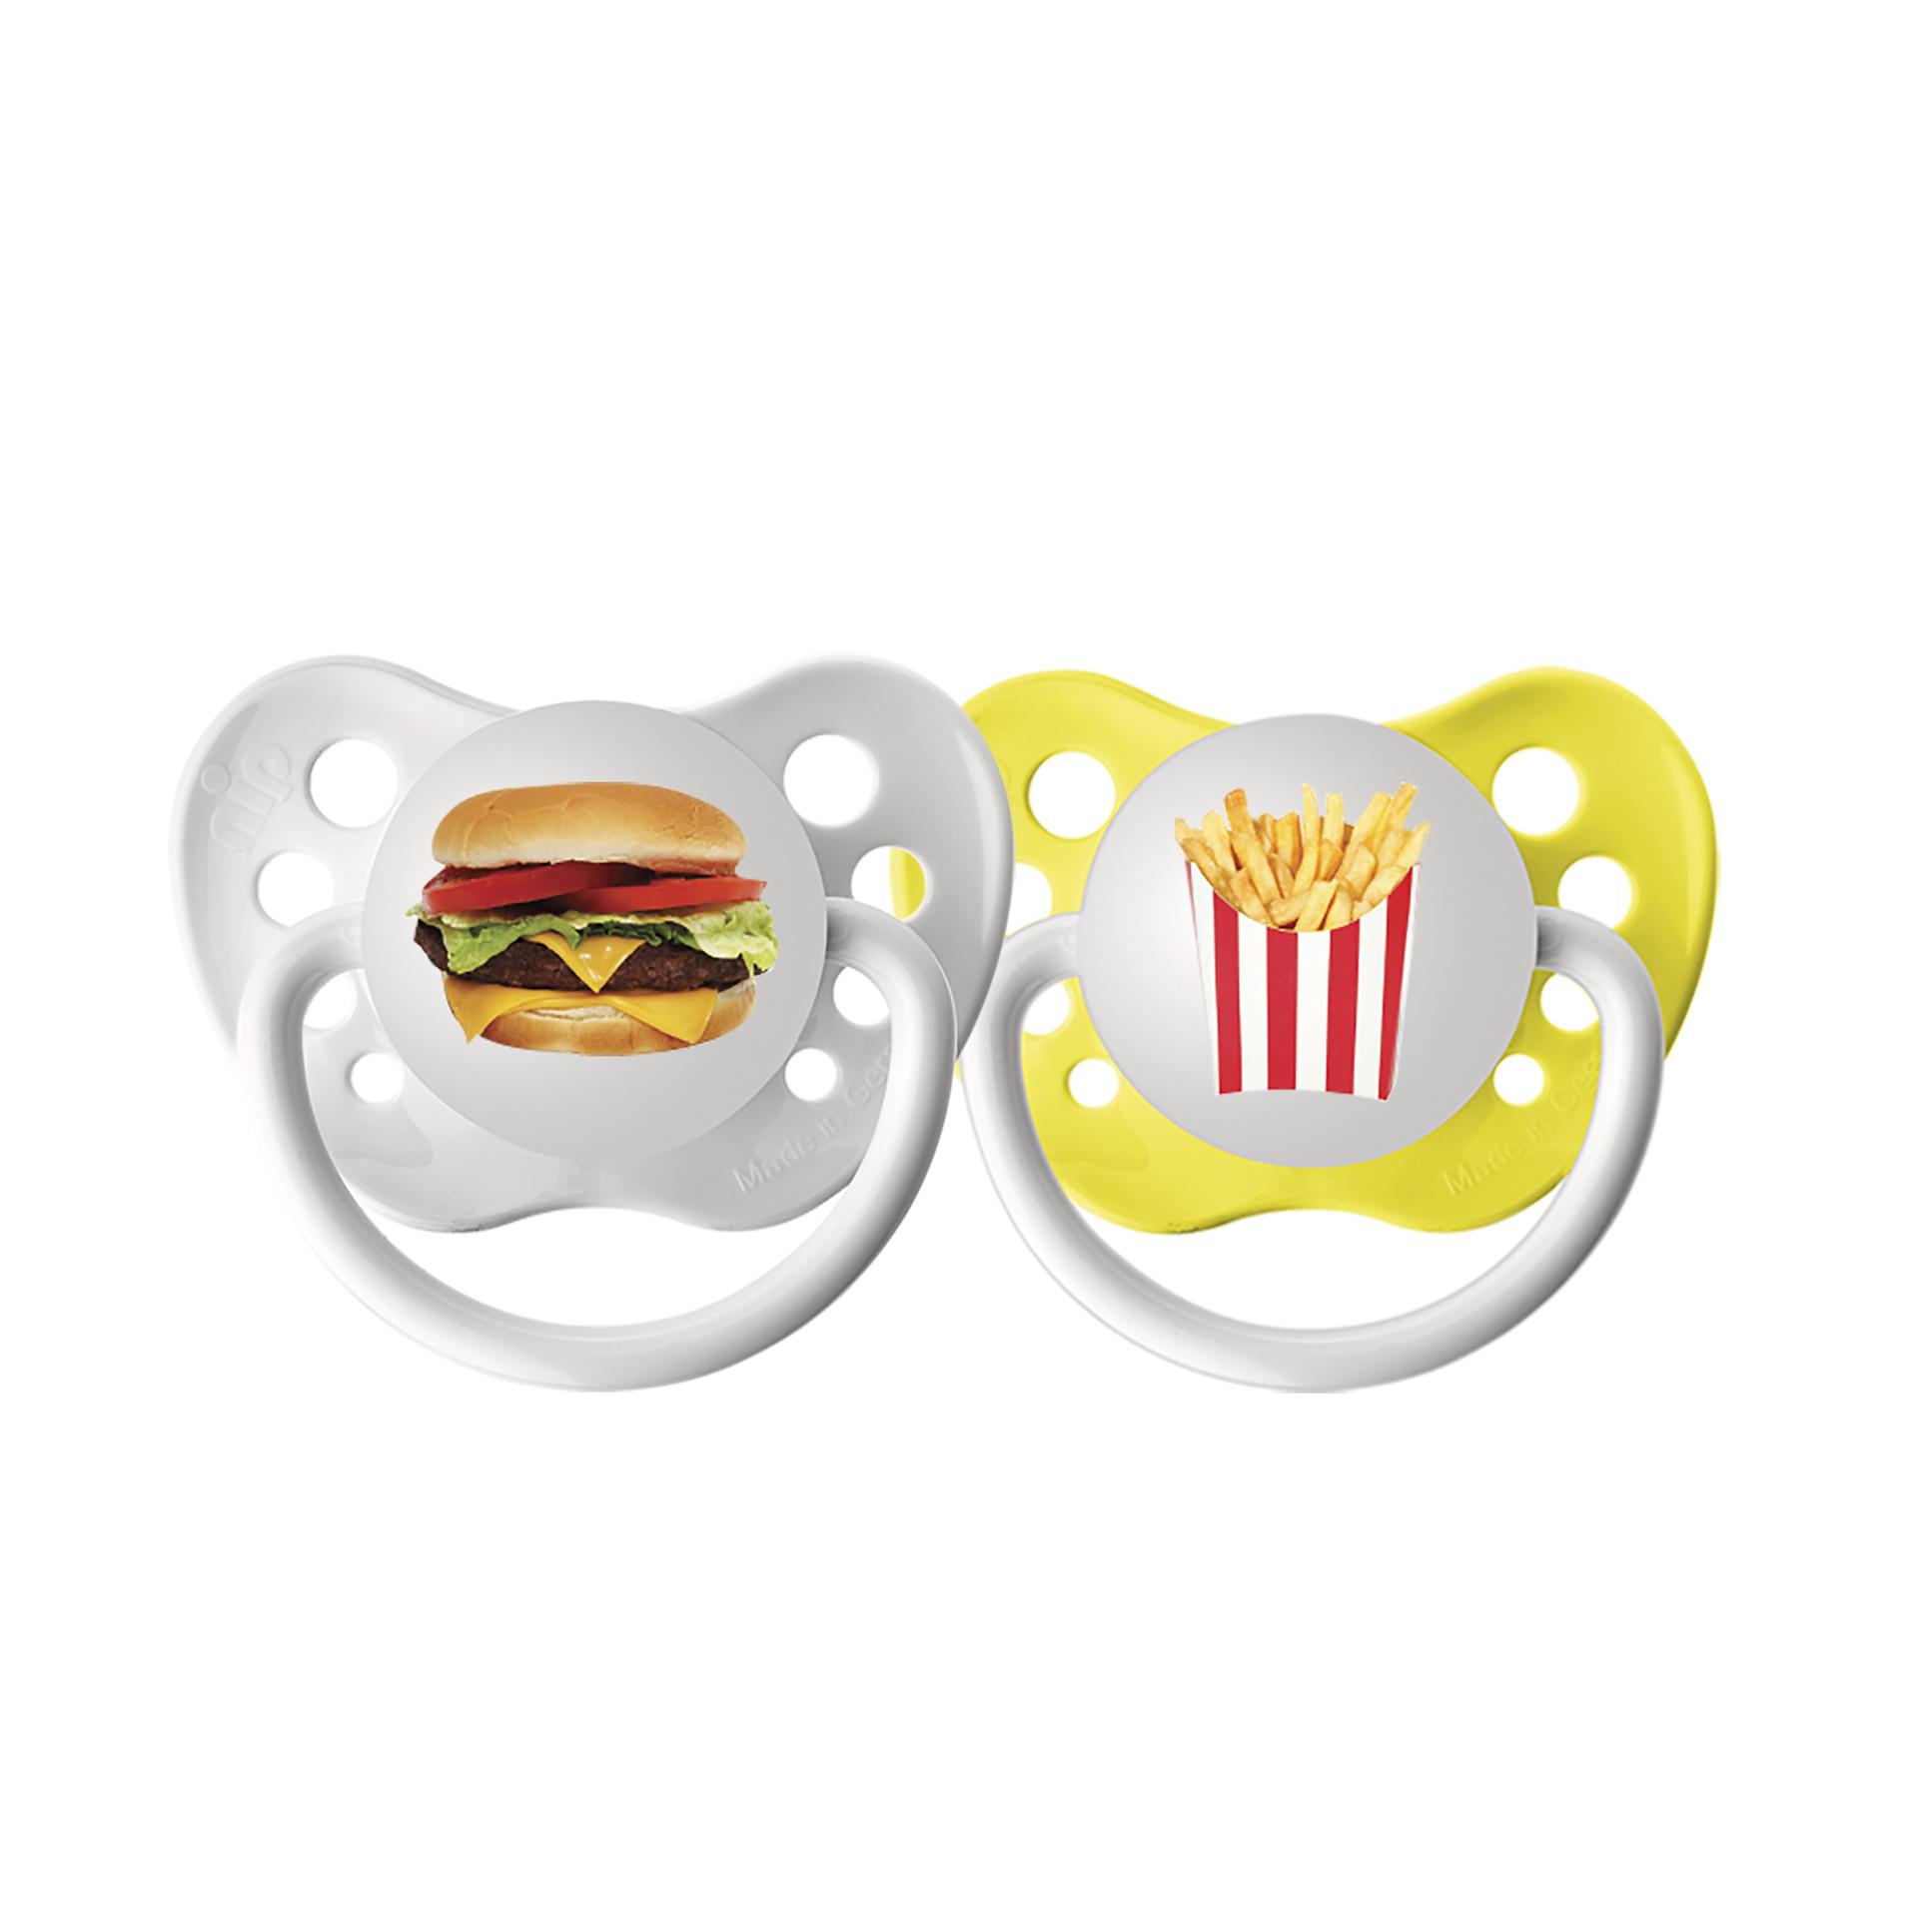 Ulubulu Burger/Fries Pacifiers, 6-18 Months, 2-Pack